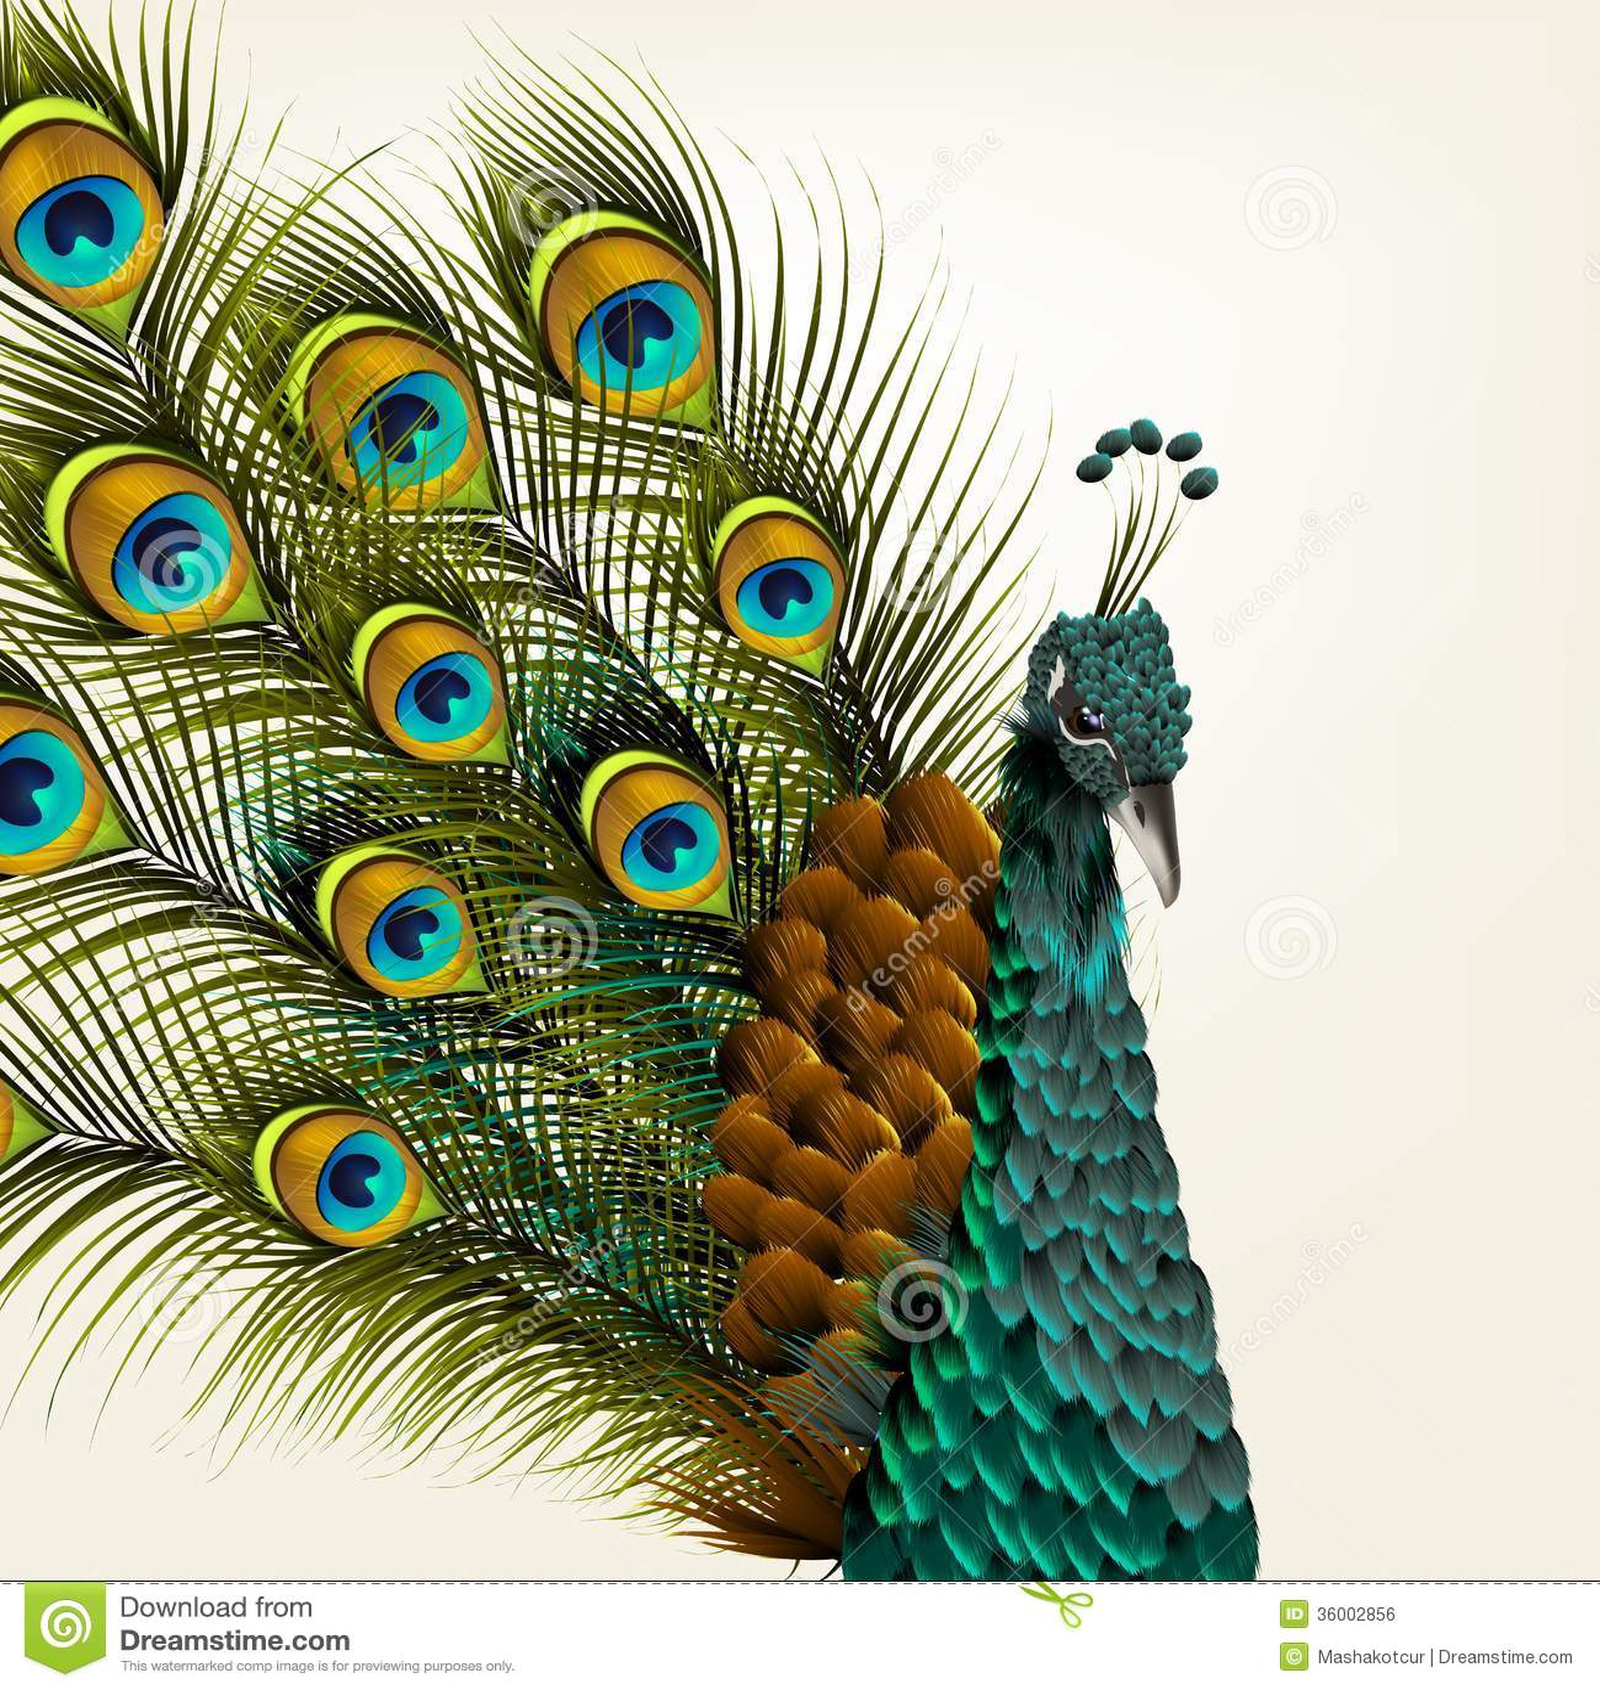 Cute white peacock - photo#22